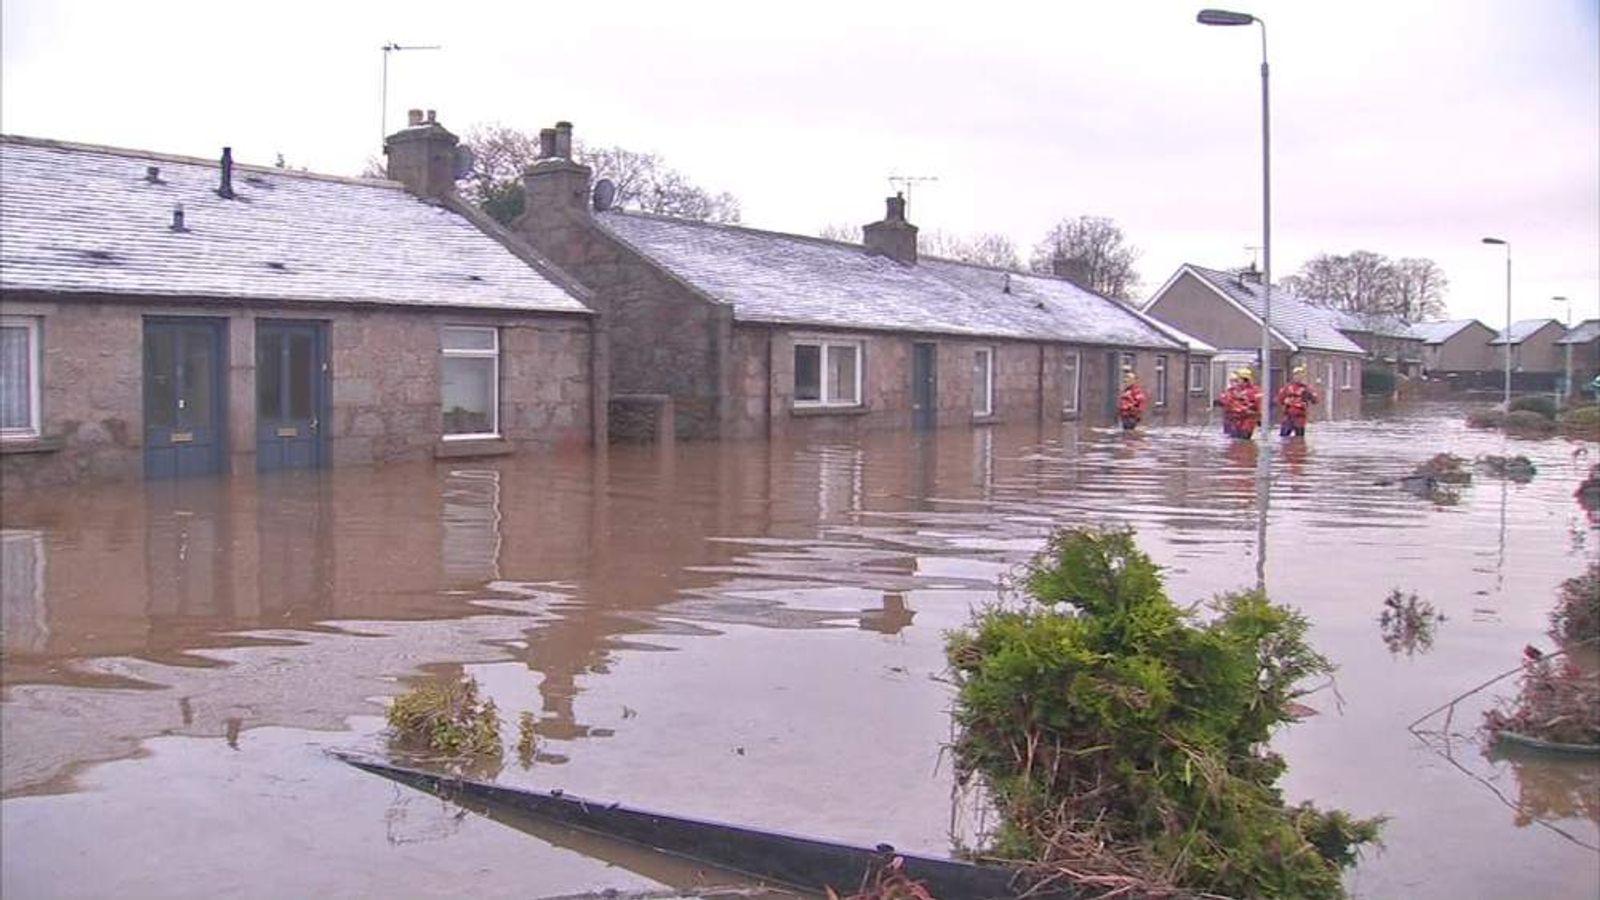 Flooding in Port Elphinstone, Aberdeenshire